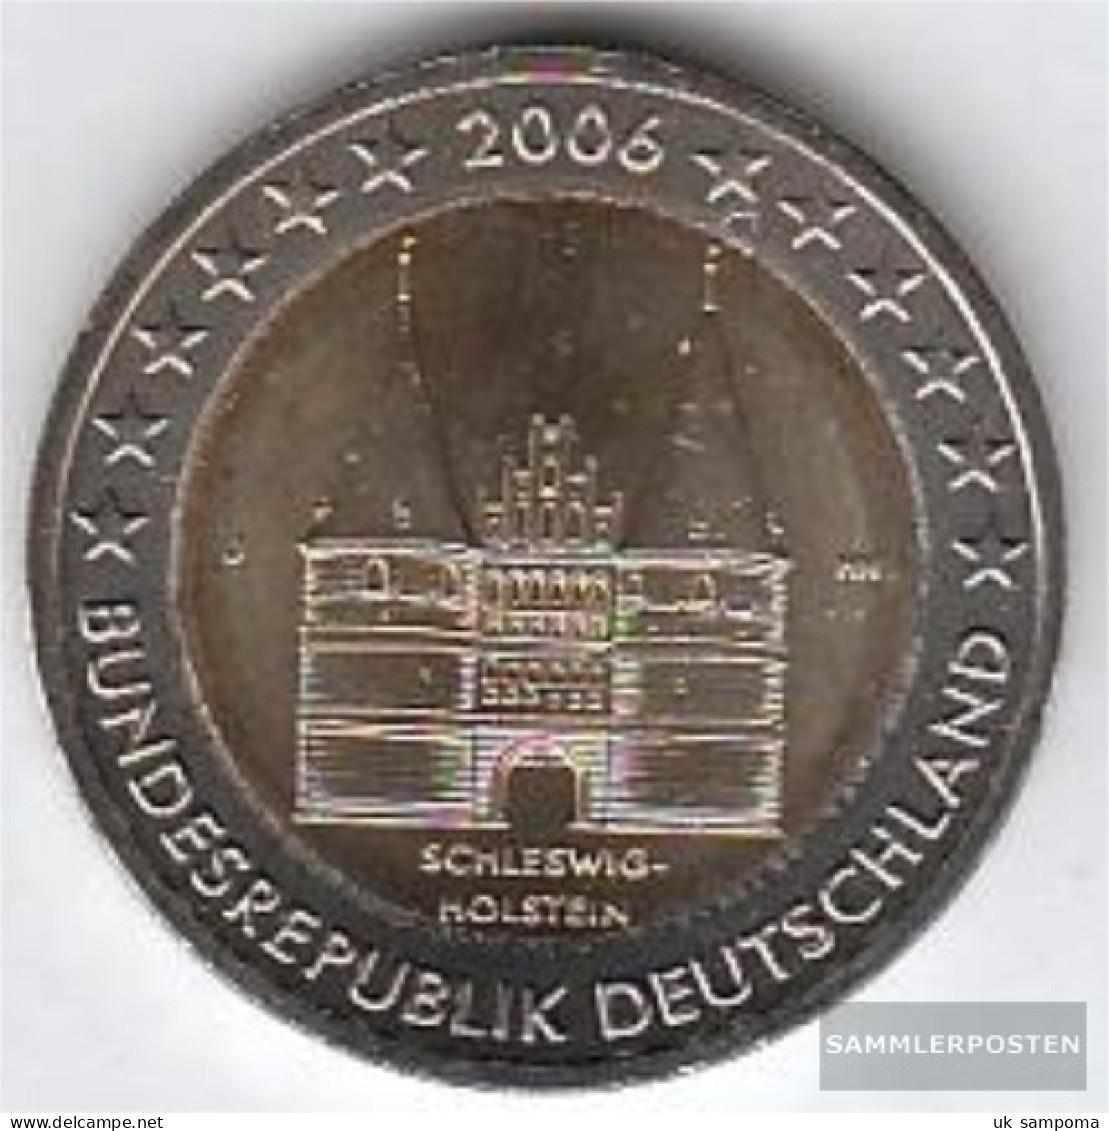 FRD (FR.Germany) Jägernr: 519 2006 J Stgl./unzirkuliert Stgl./unzirkuliert 2006 2 Euro Holstentor Lübeck - Germany